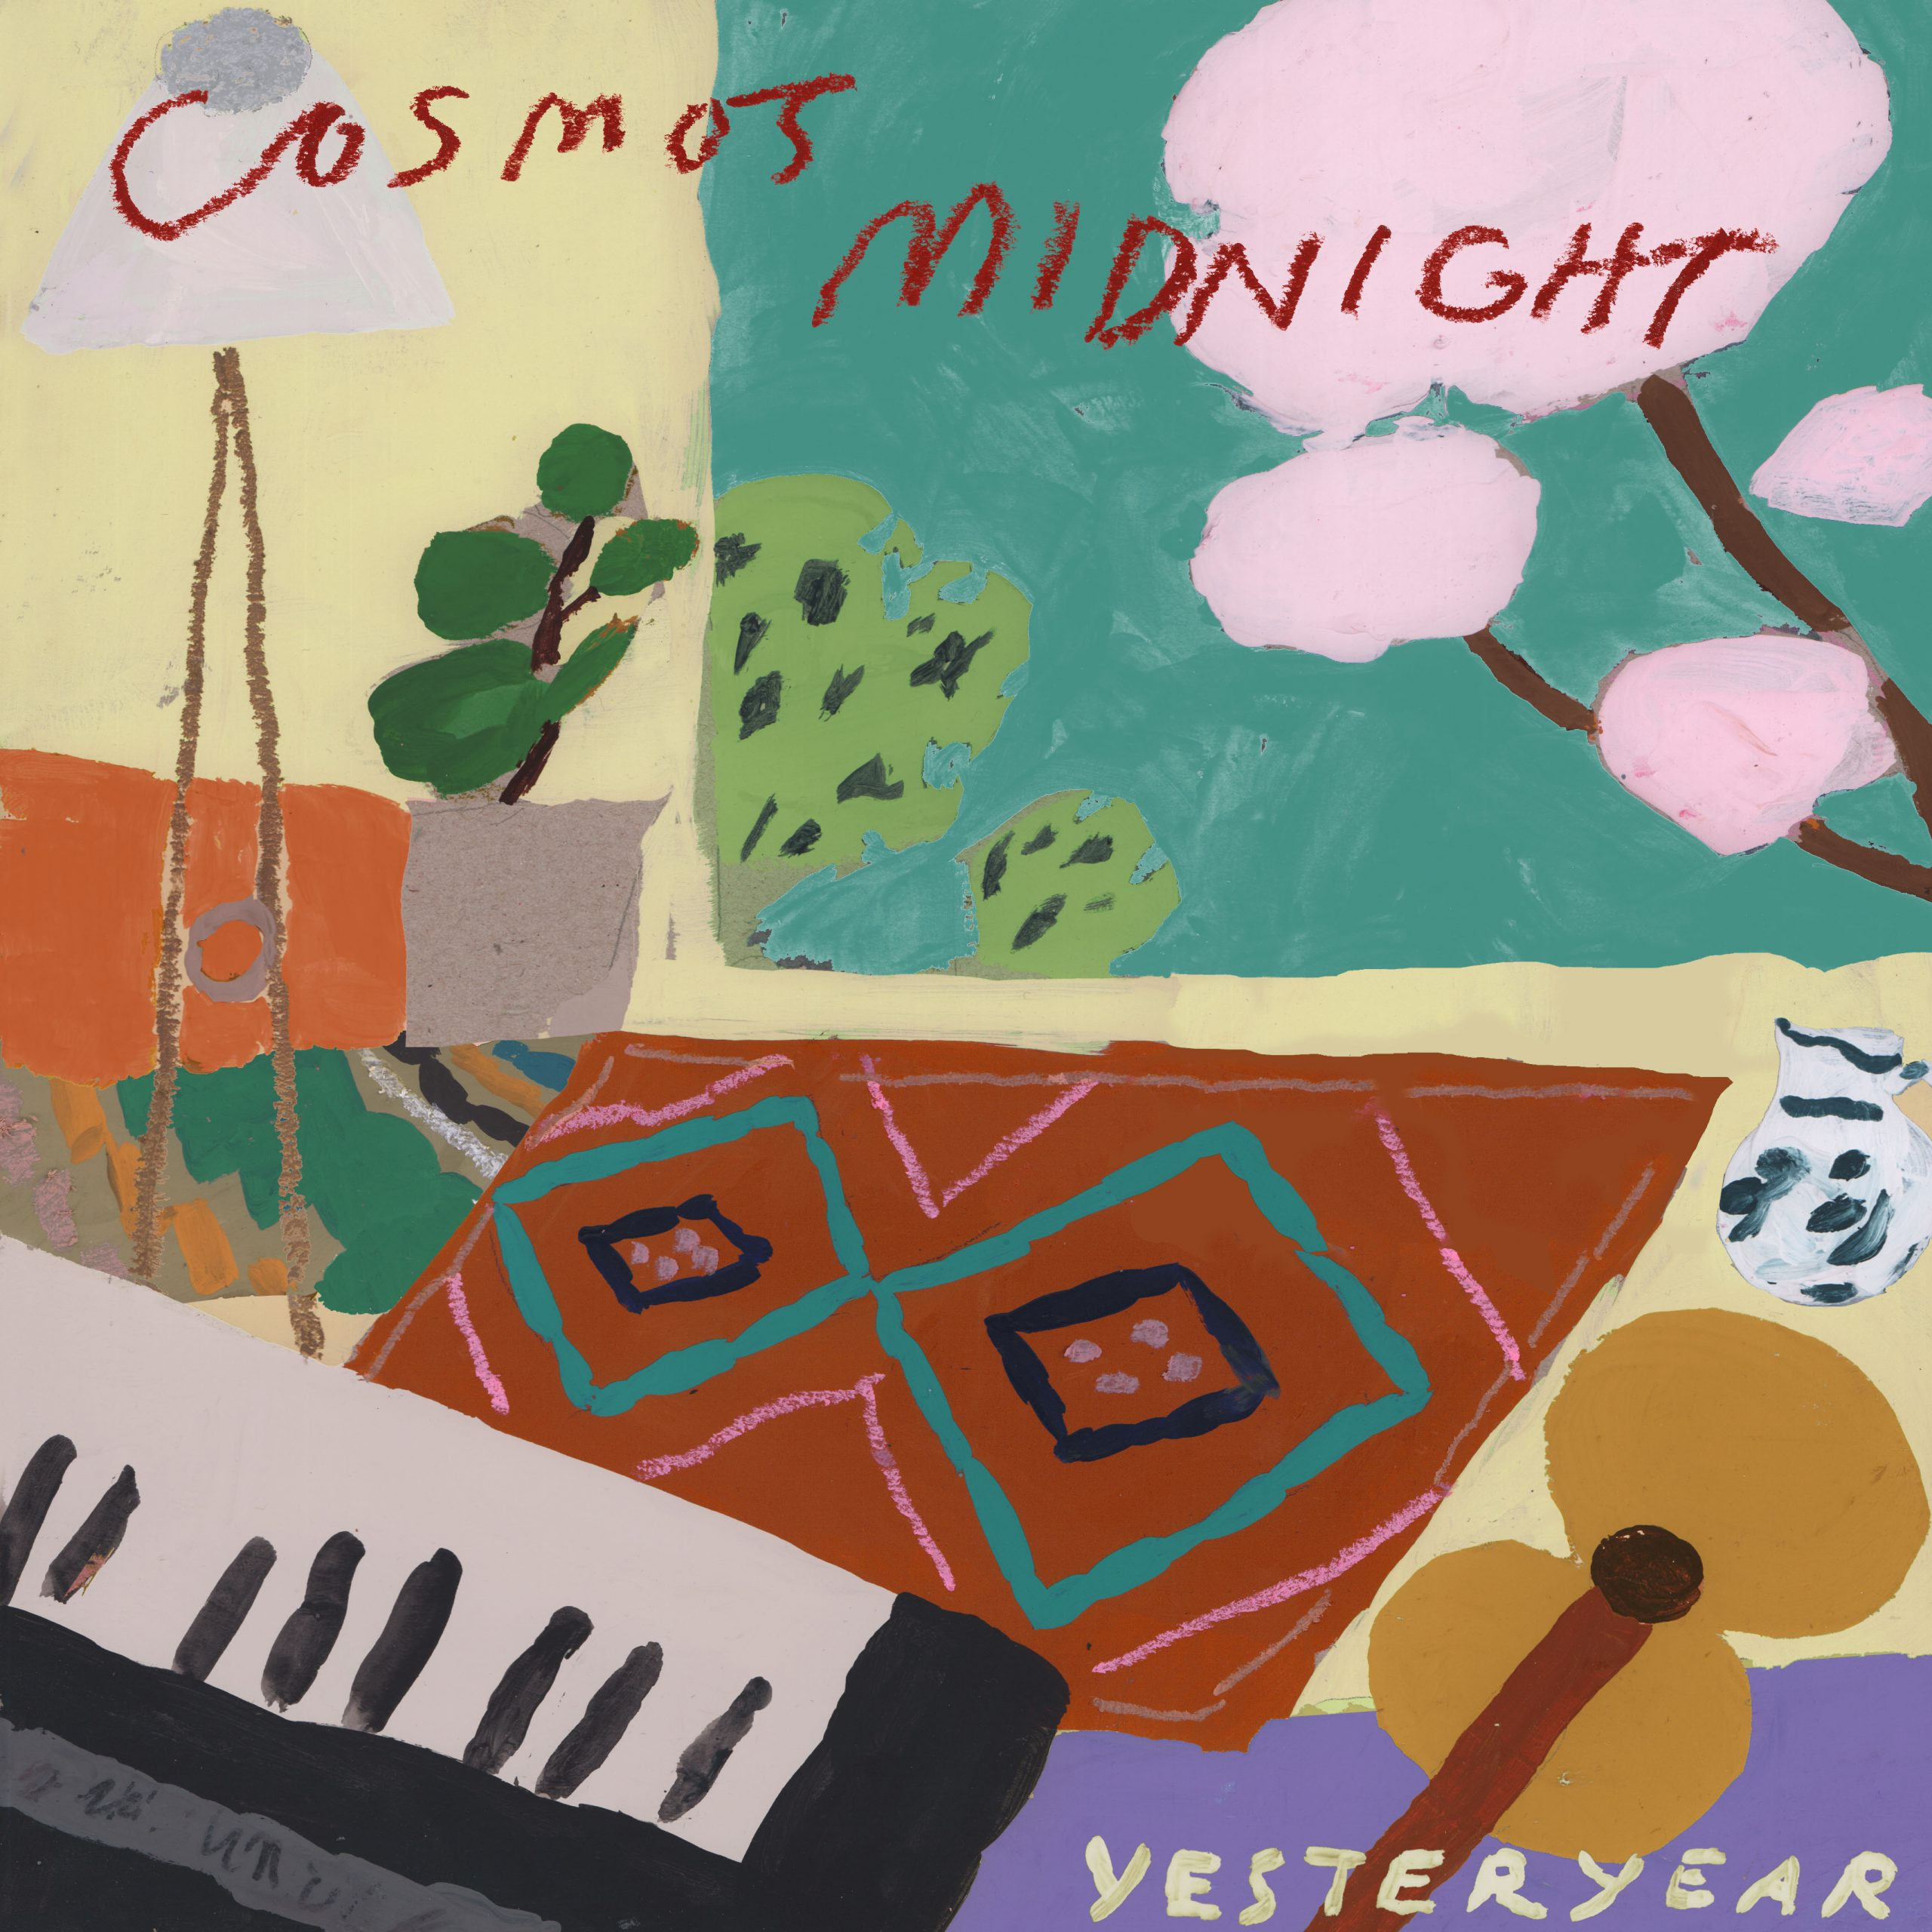 "Cosmo's Midnight - ""Yesteryear"" album artwork"